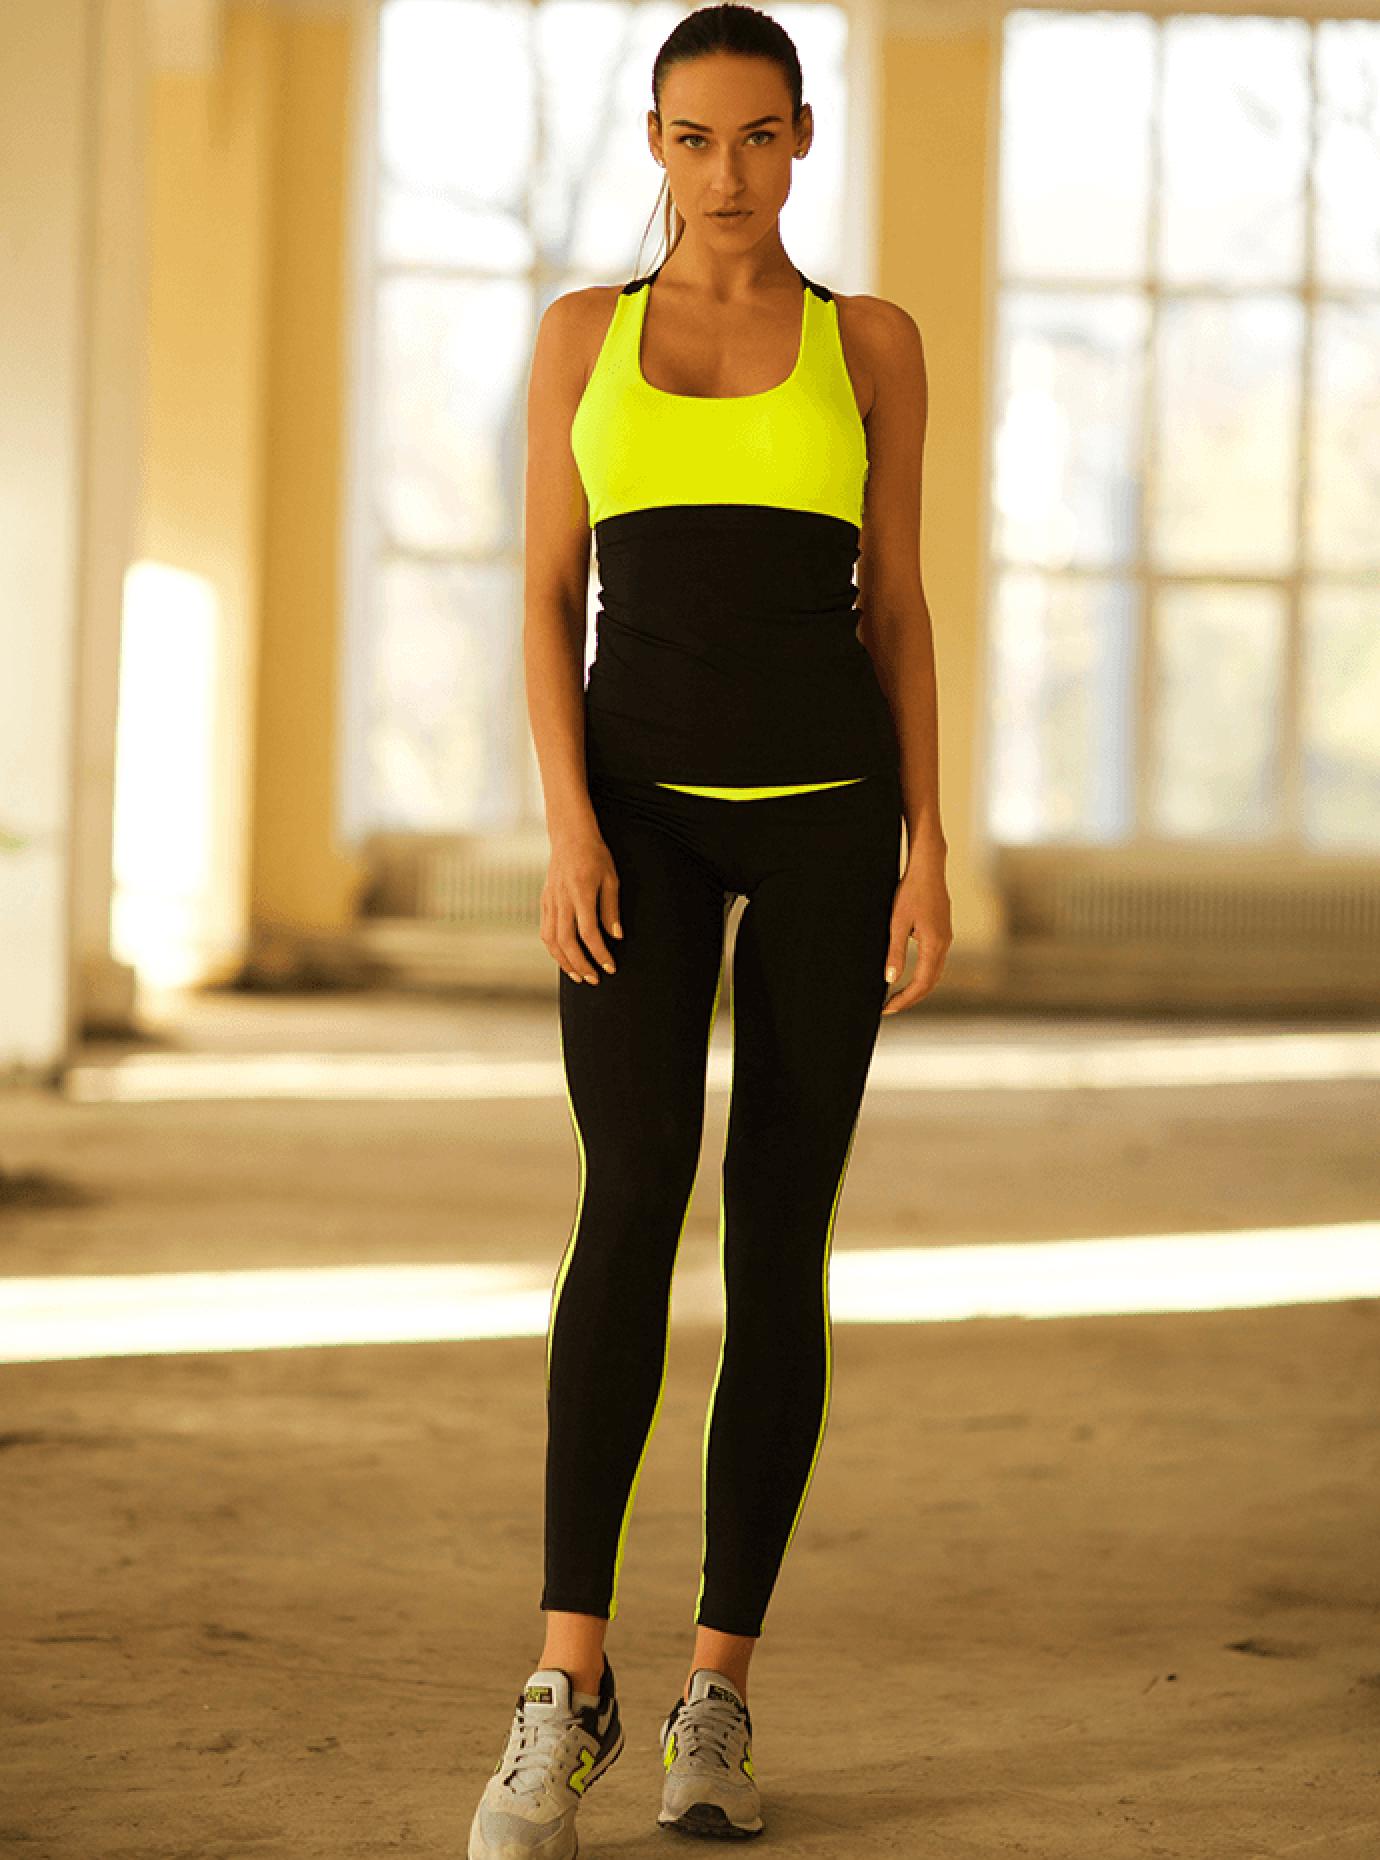 Комплект женский Basic Lemon Low Rise Leggings Серый S (01-F171104): фото - Alster.ua